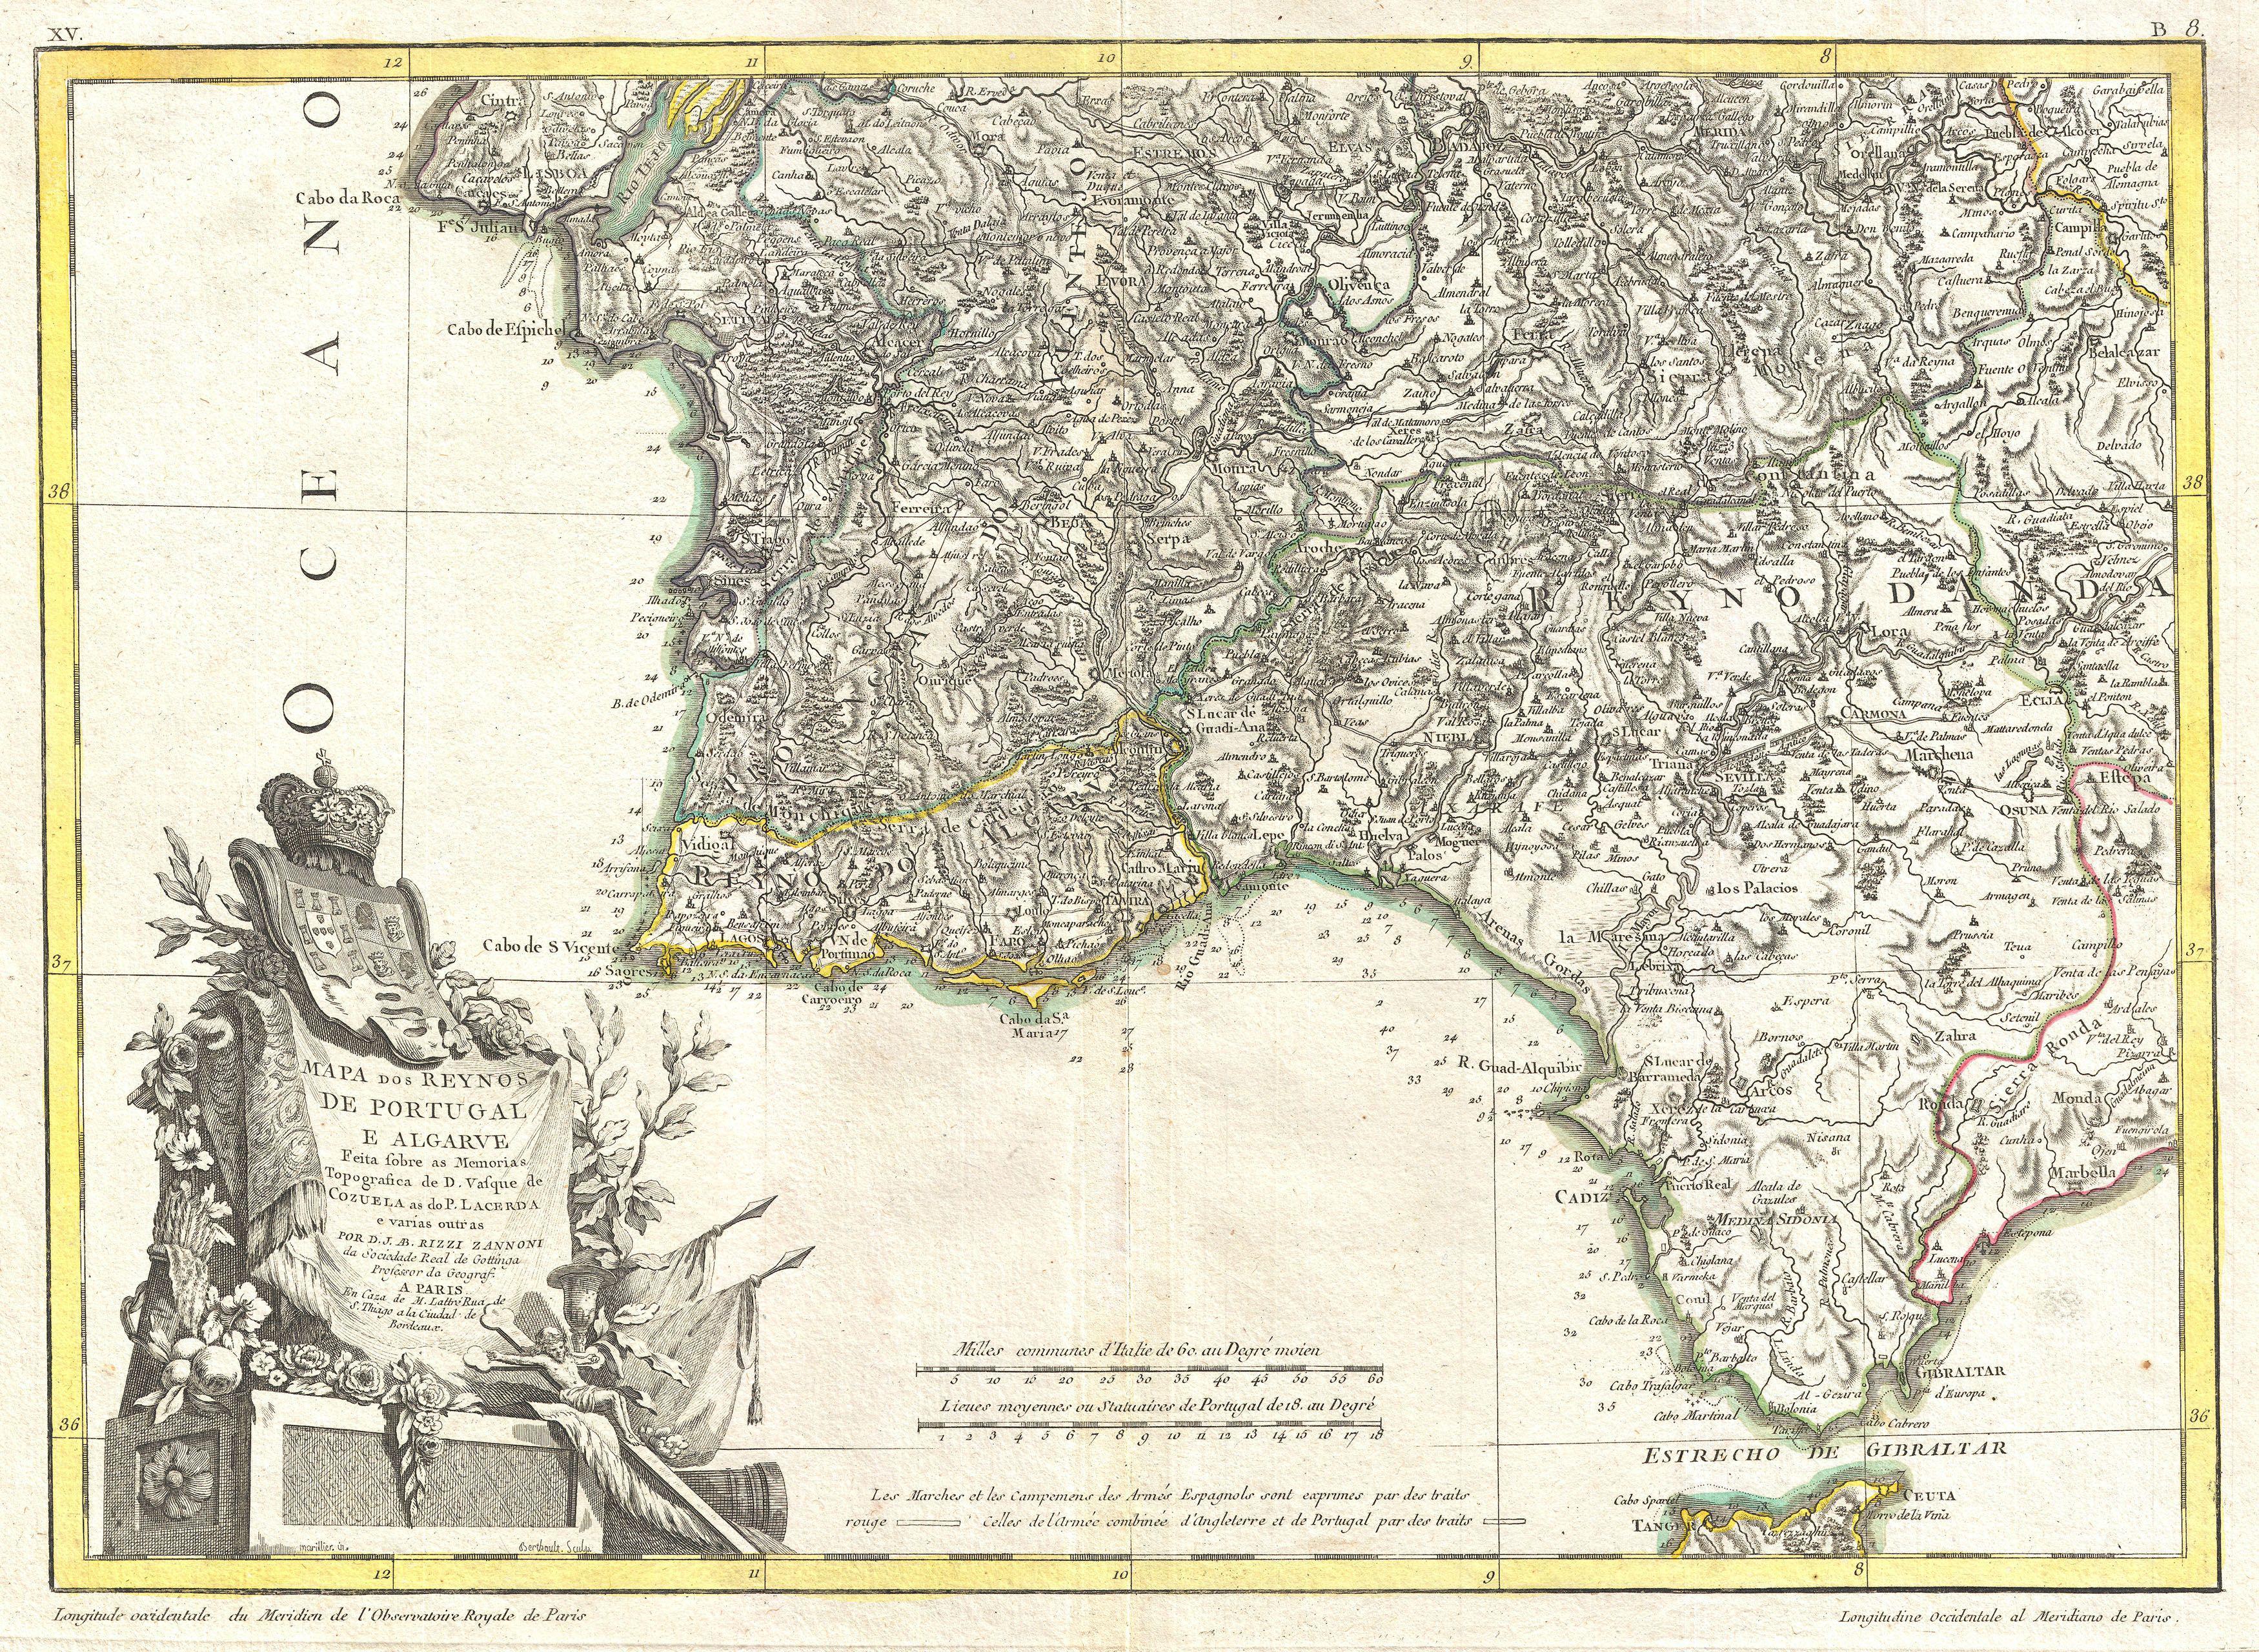 File:1775 Zannoni Map of Southern Portugal, the Algarve, and Seville ...